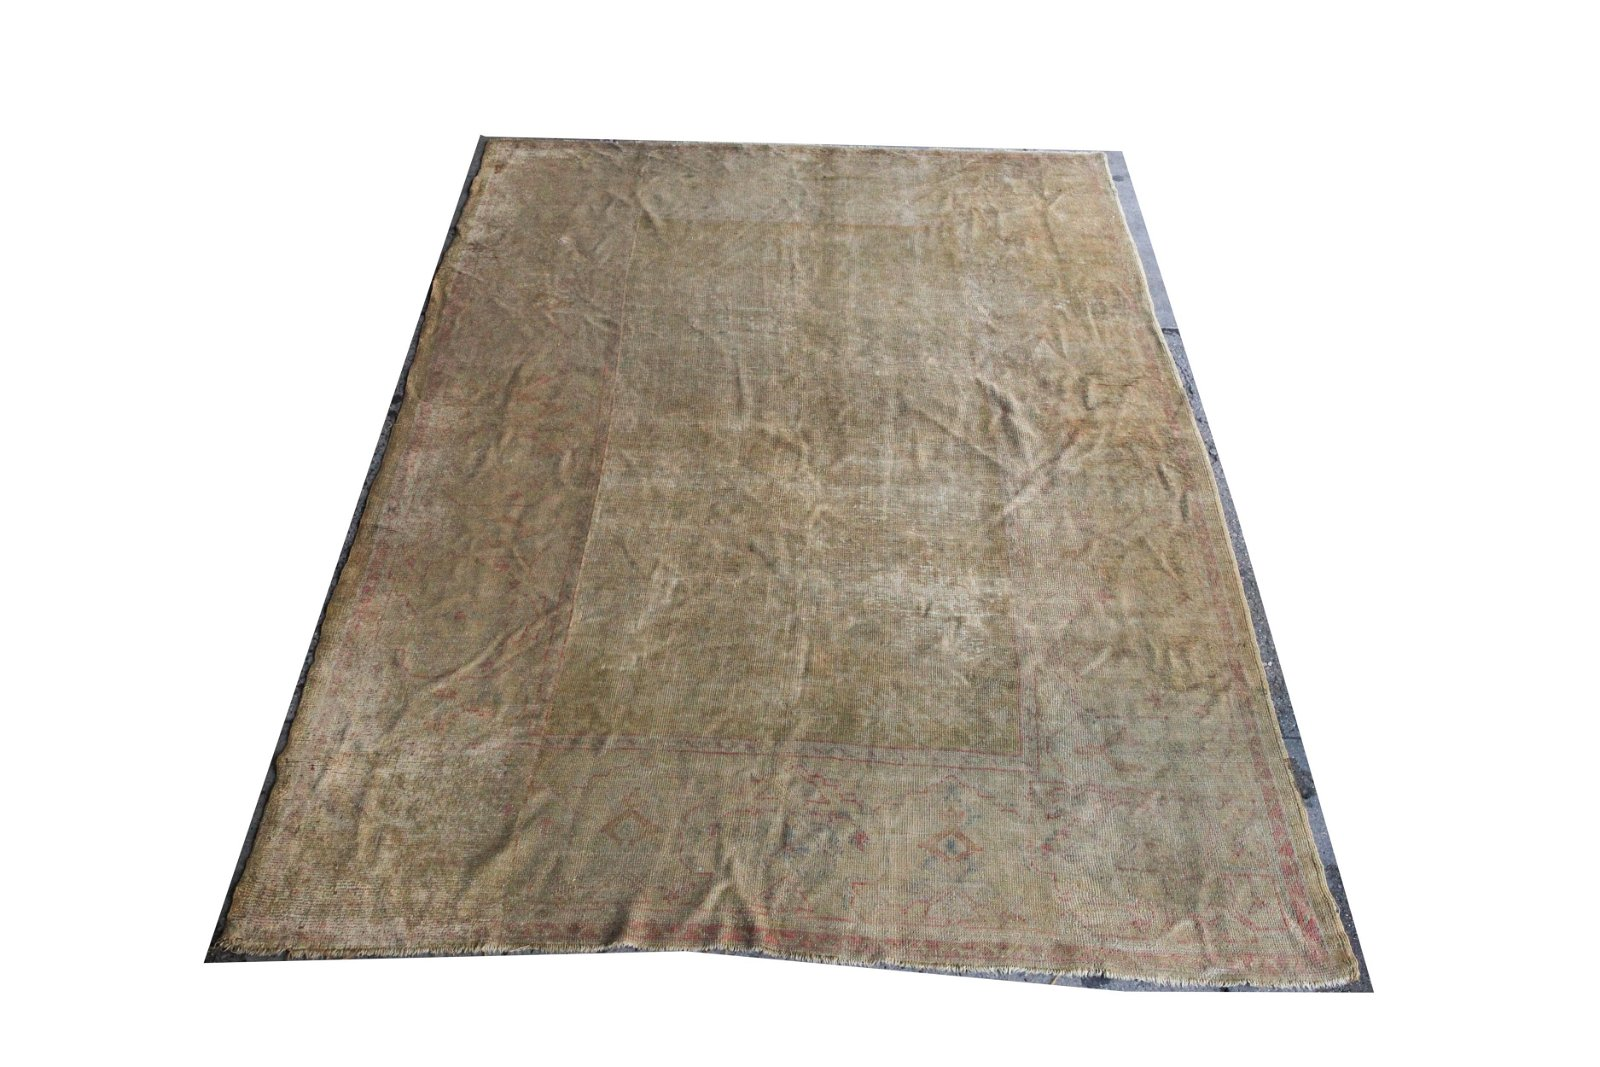 "Oushak Carpet with Geometric Motifs 7' 1"" x 9' 8"""